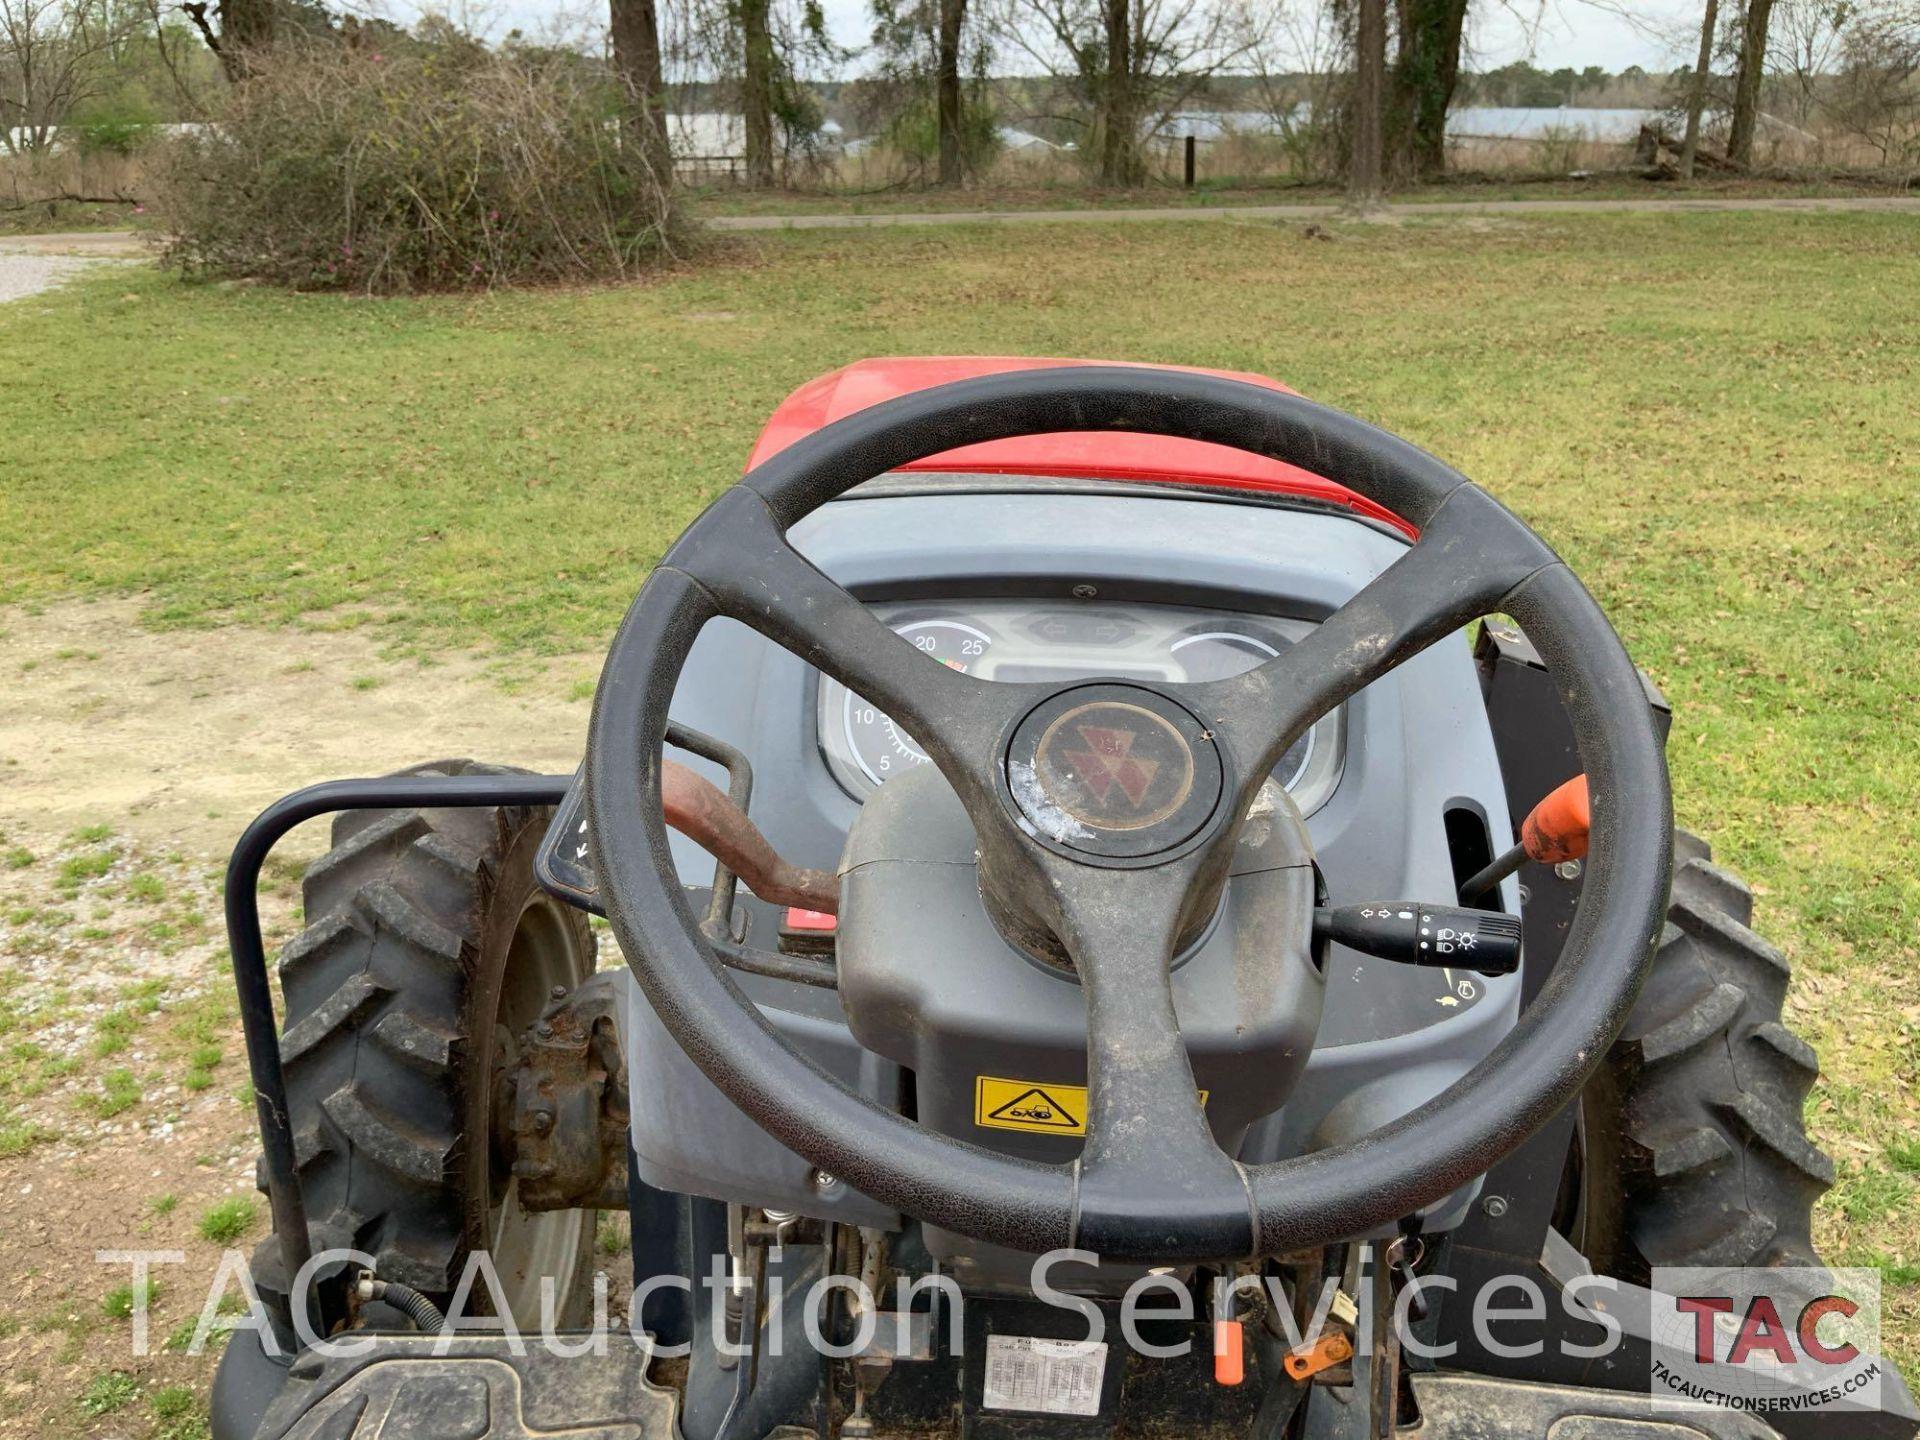 Massey-Ferguson 4610LP Farm Tractor - Image 14 of 26